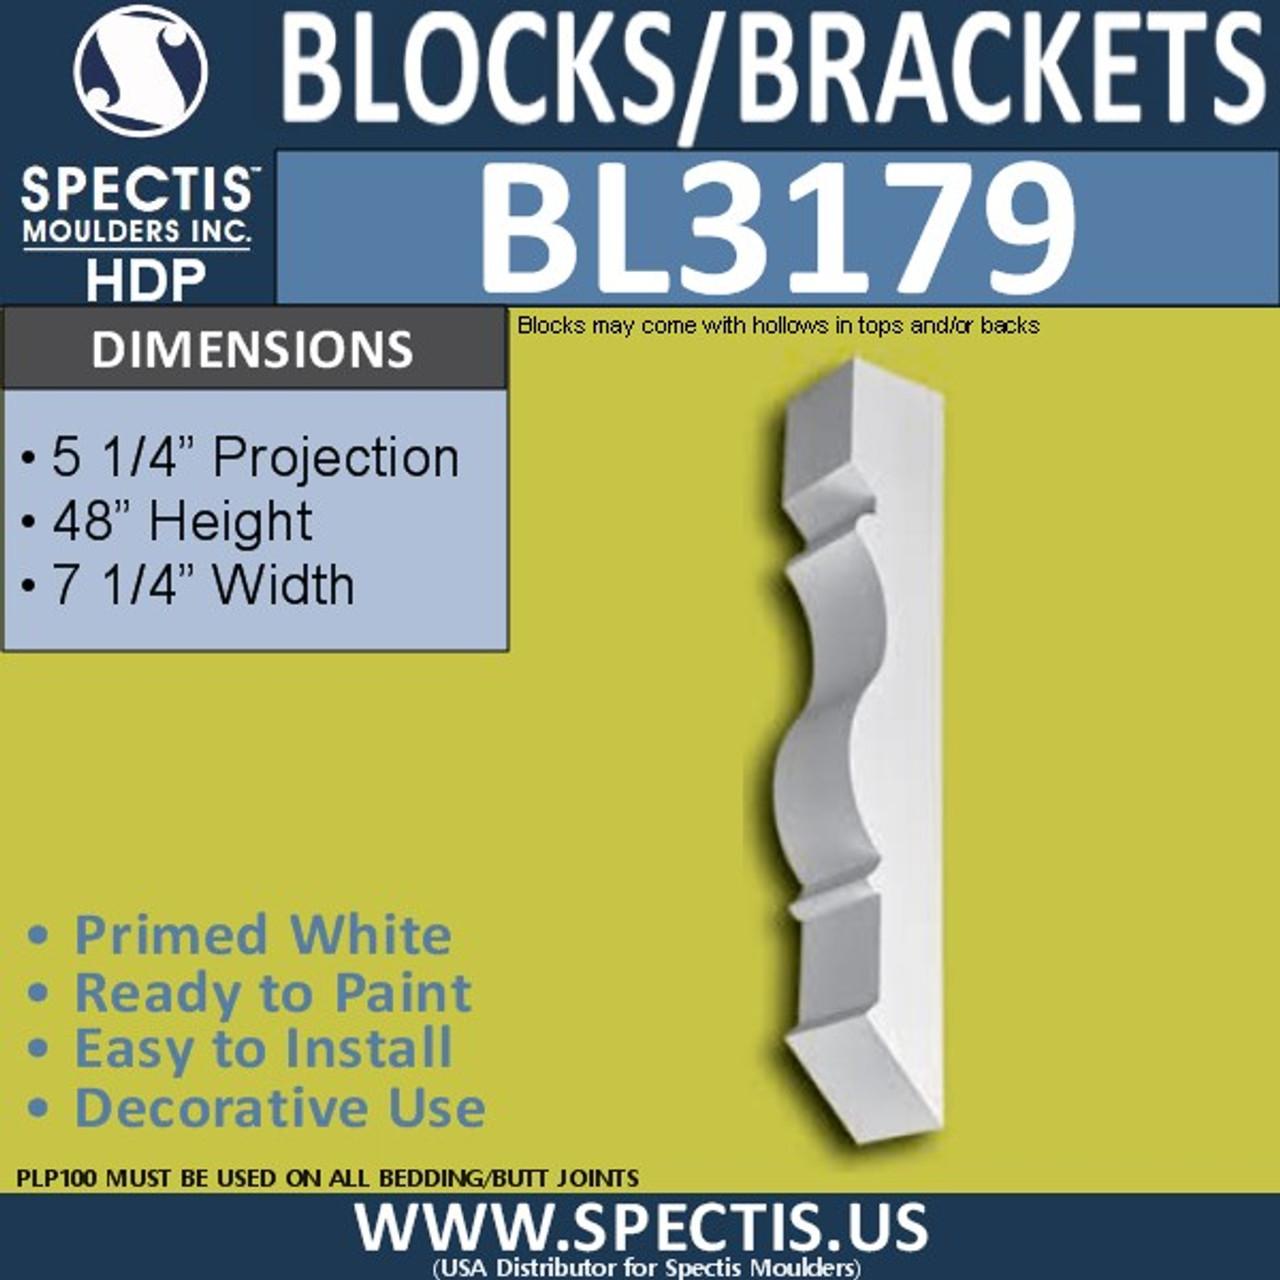 "BL3179 Eave Block or Bracket 7.25""W x 48""H x 5.25""P"